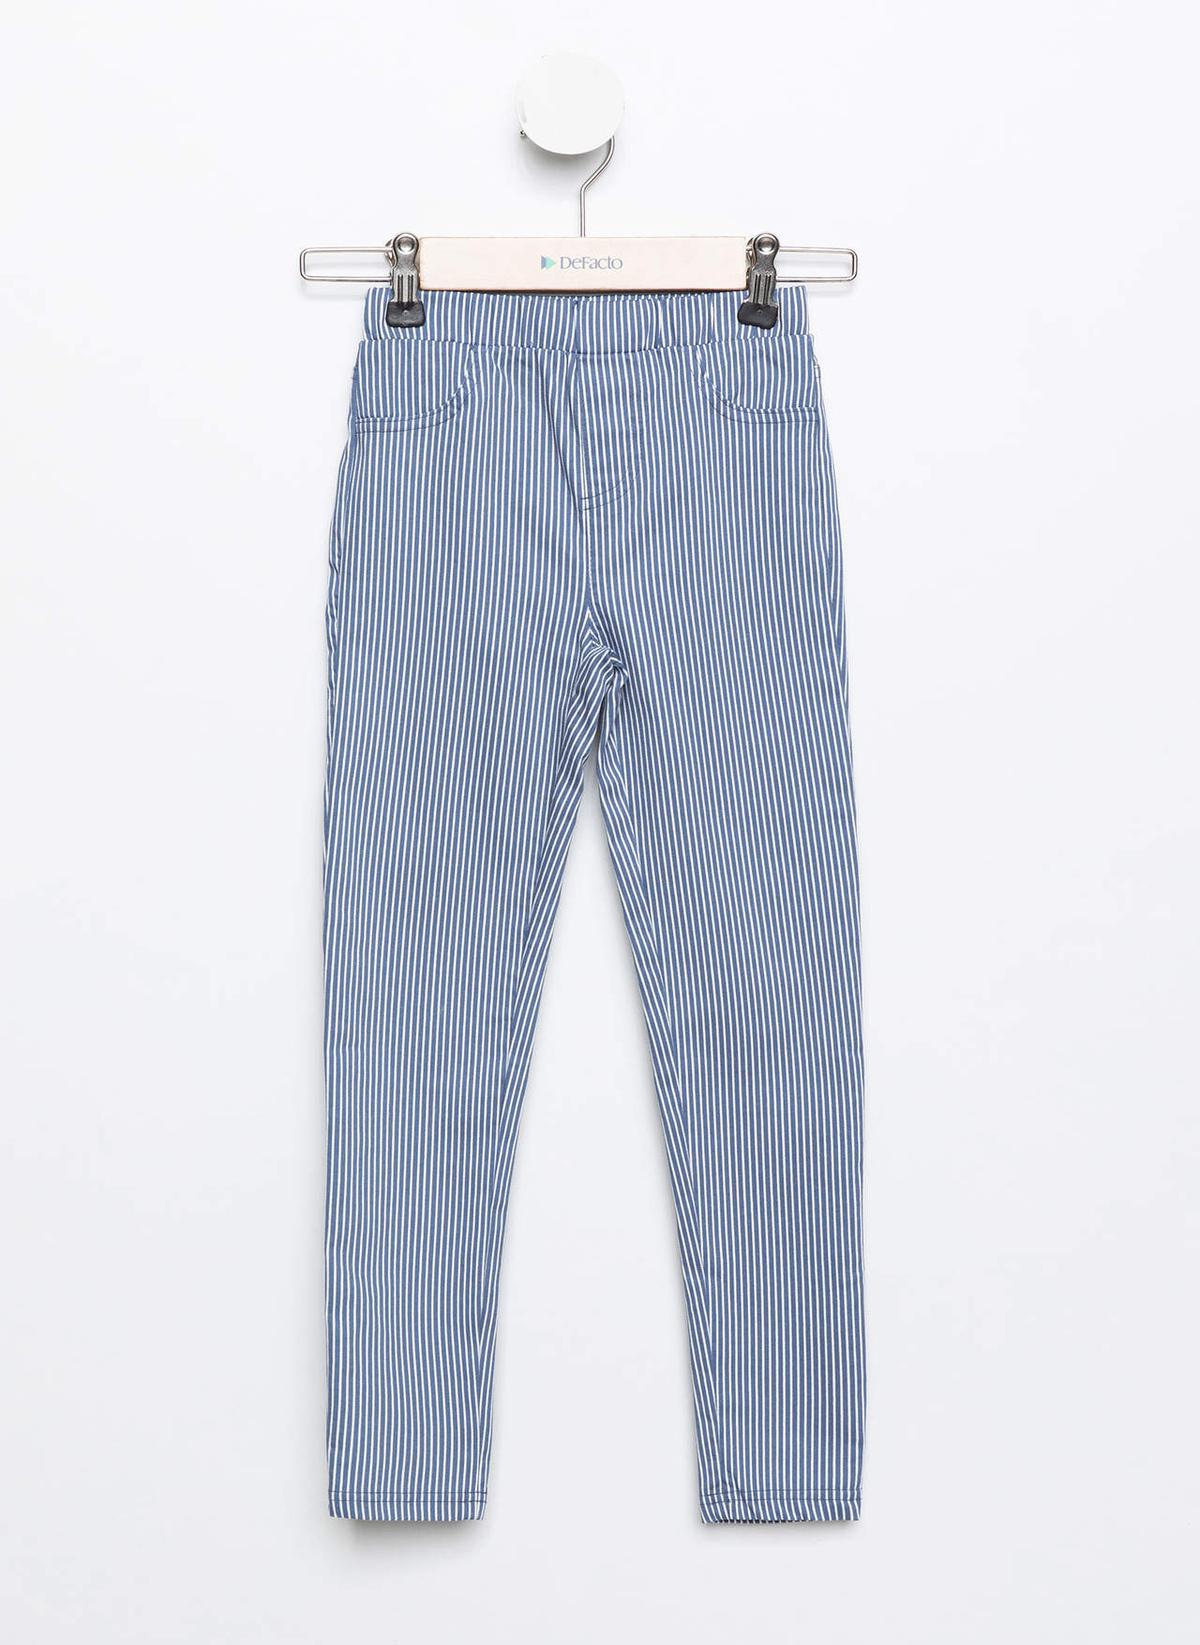 Defacto Pantolon K4789a619spbe458 Çizgili Skinny Fit Chin – 44.99 TL